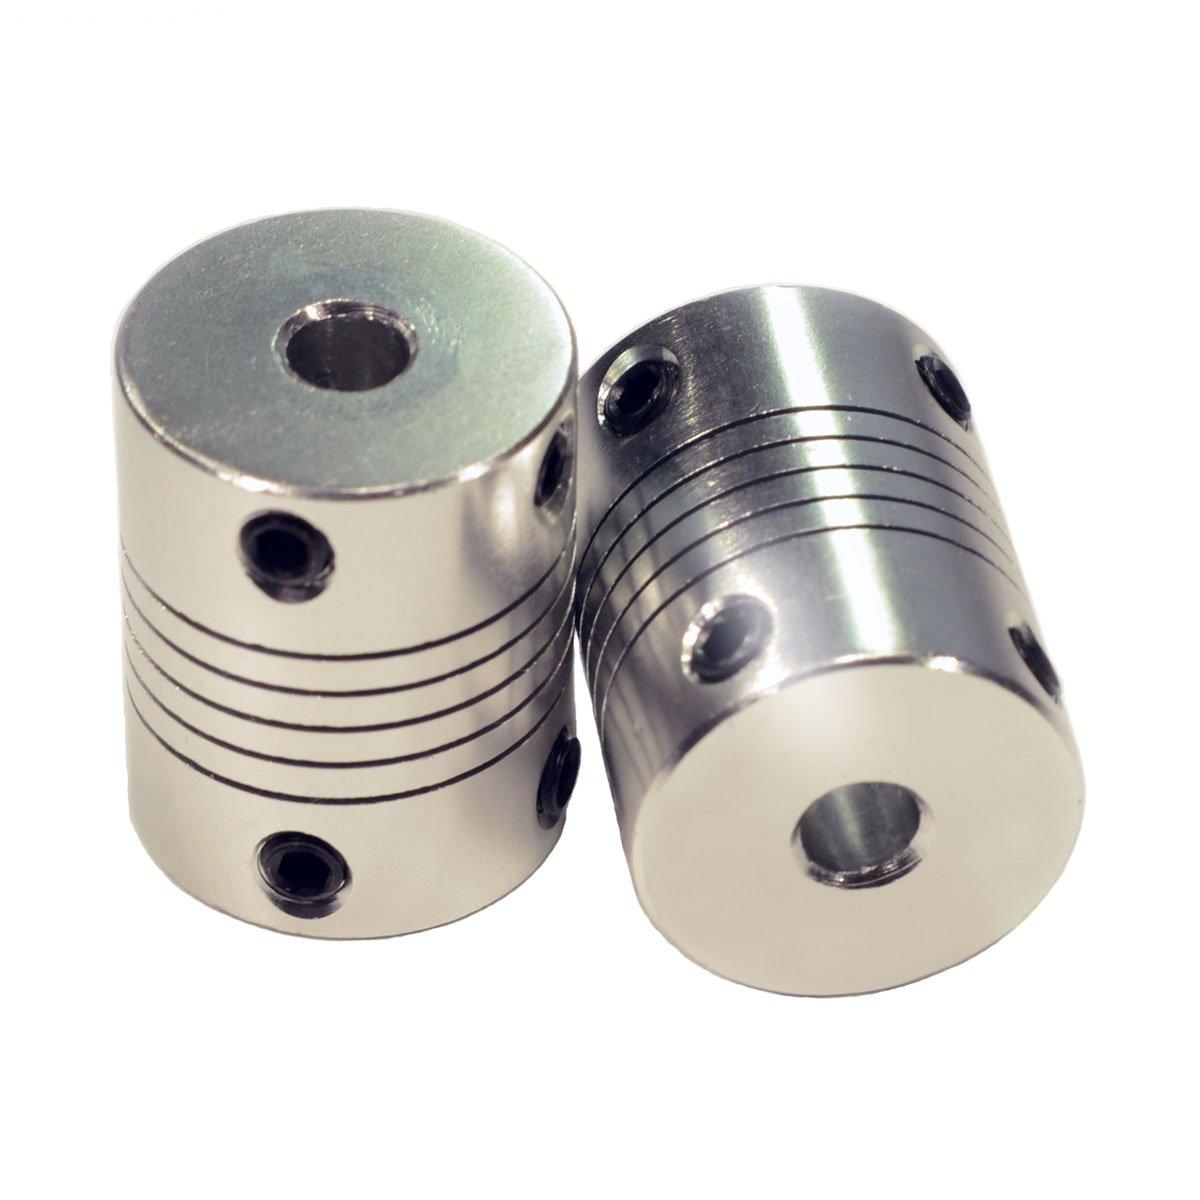 OctagonStar Flexible Couplings 5mm to 5mm NEMA 17 Shaft for RepRap 3D Printer or CNC Machine(2PCS)